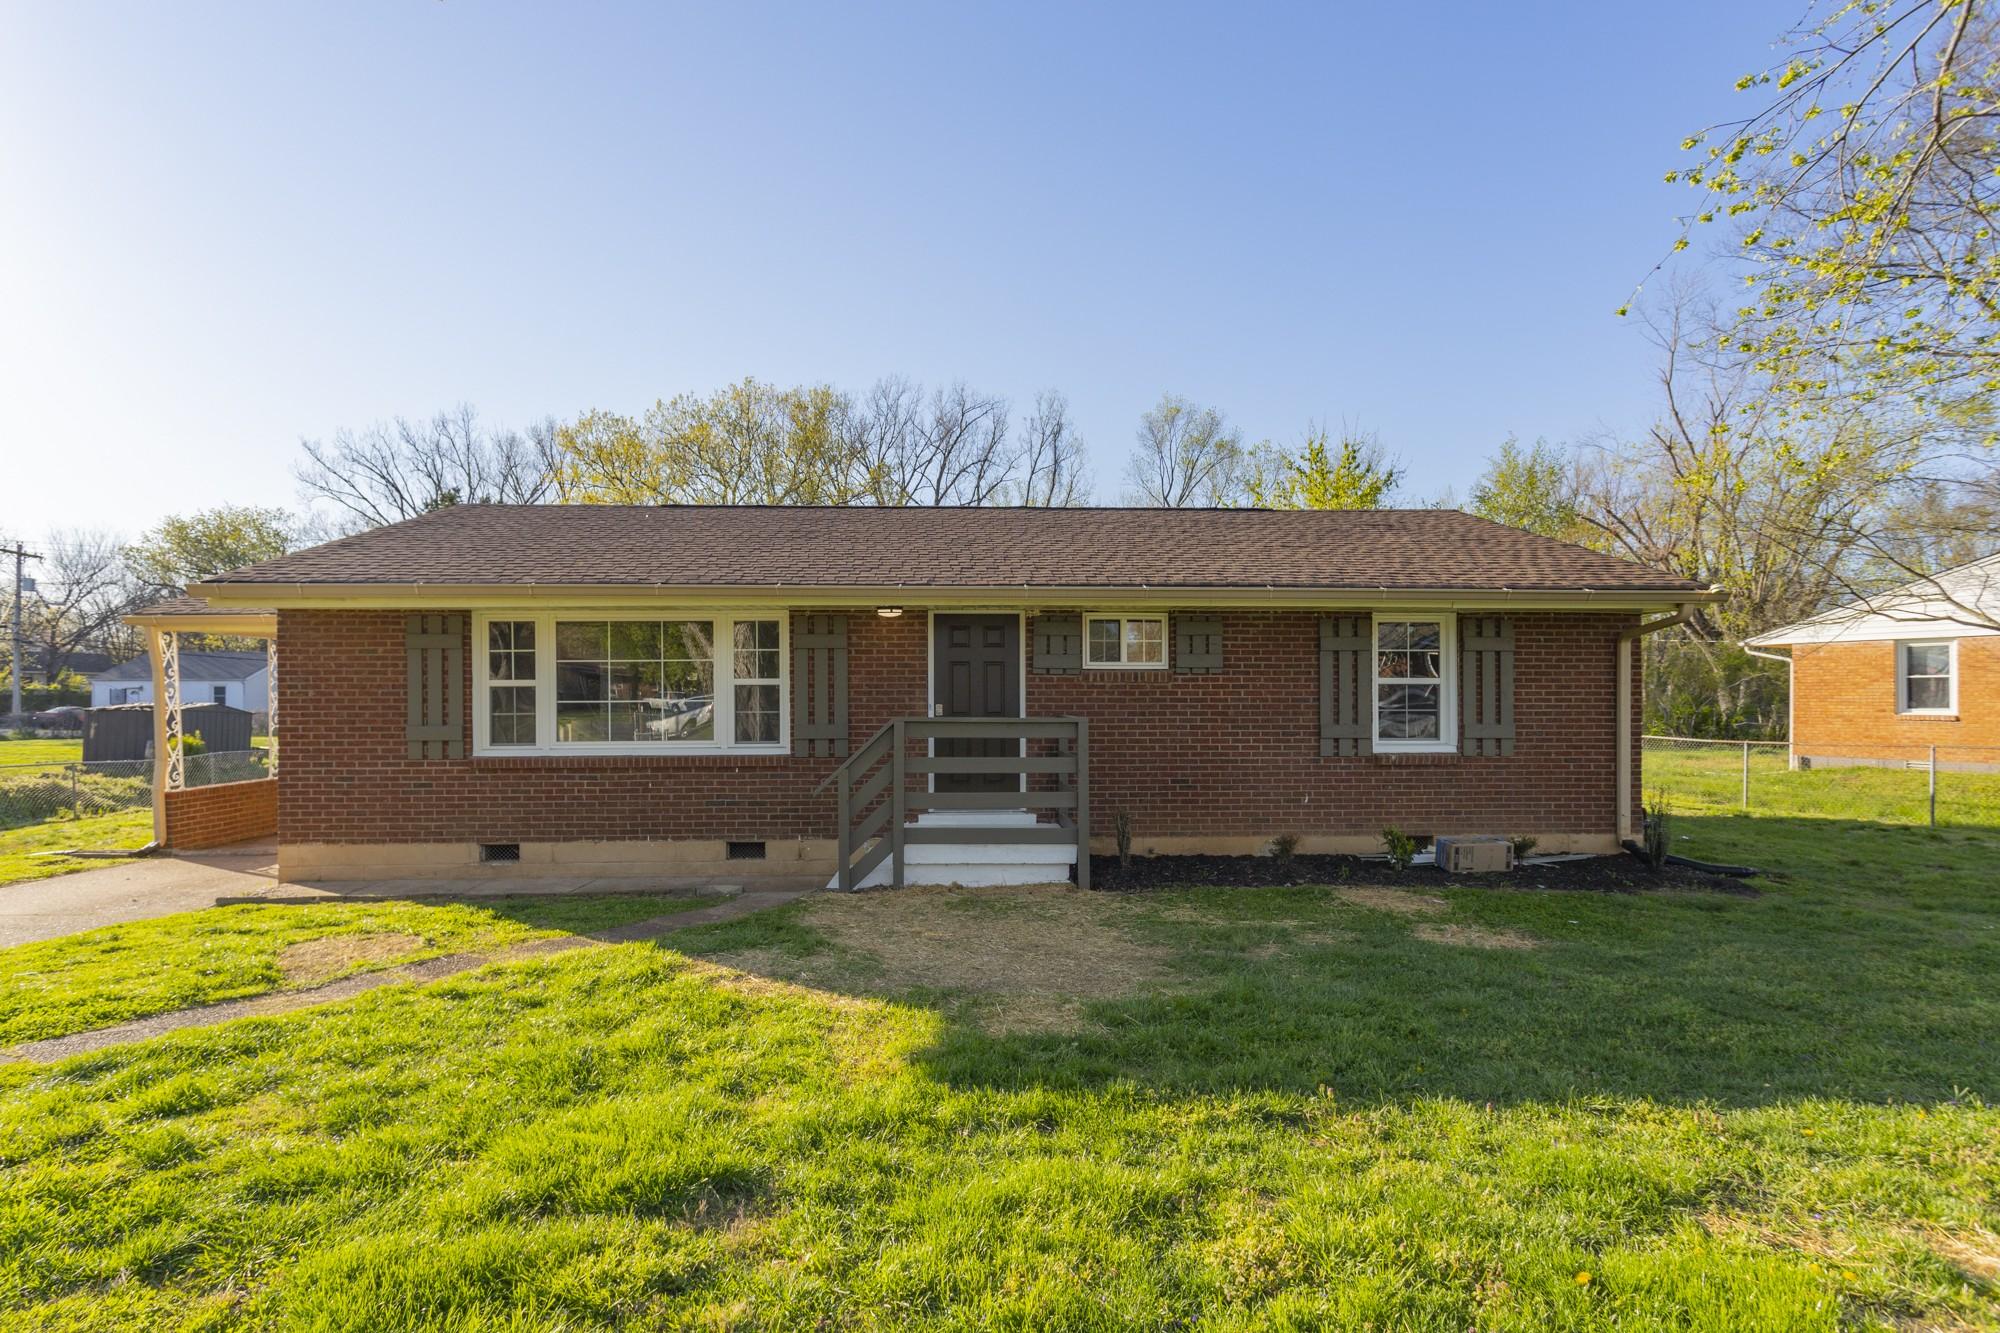 113 Park Ln Property Photo - Clarksville, TN real estate listing